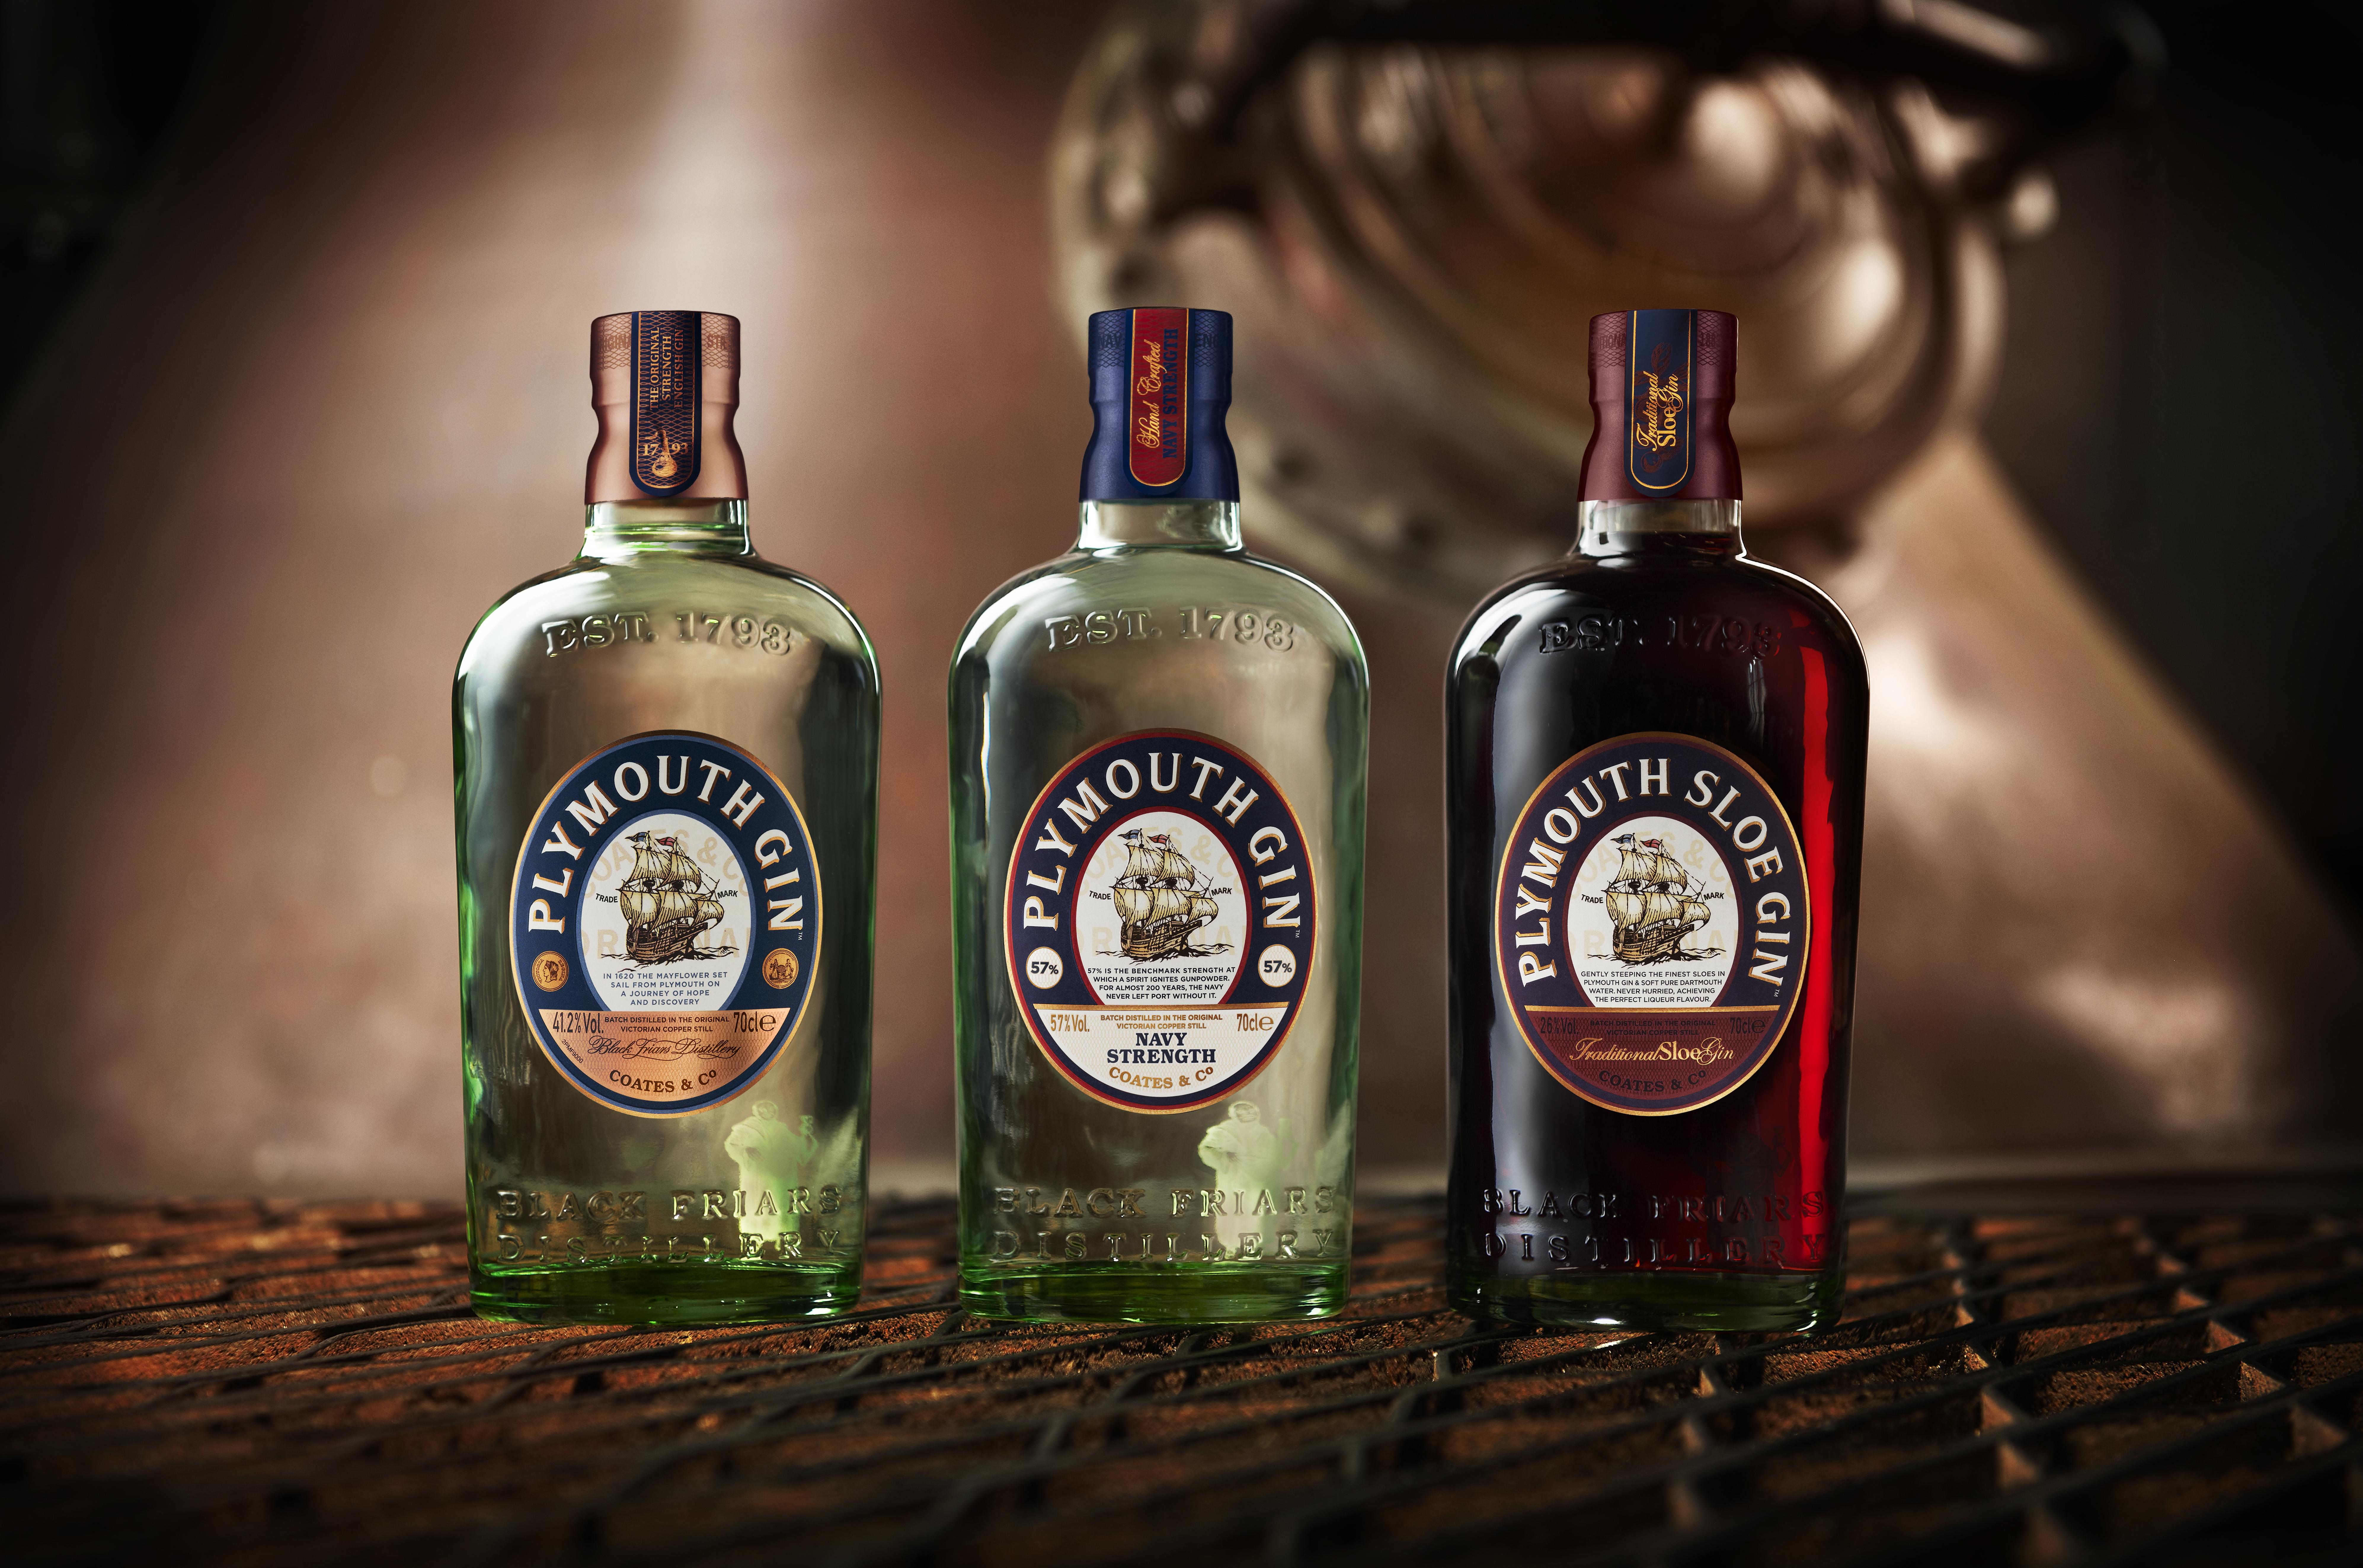 Plymouth Gin Bottles